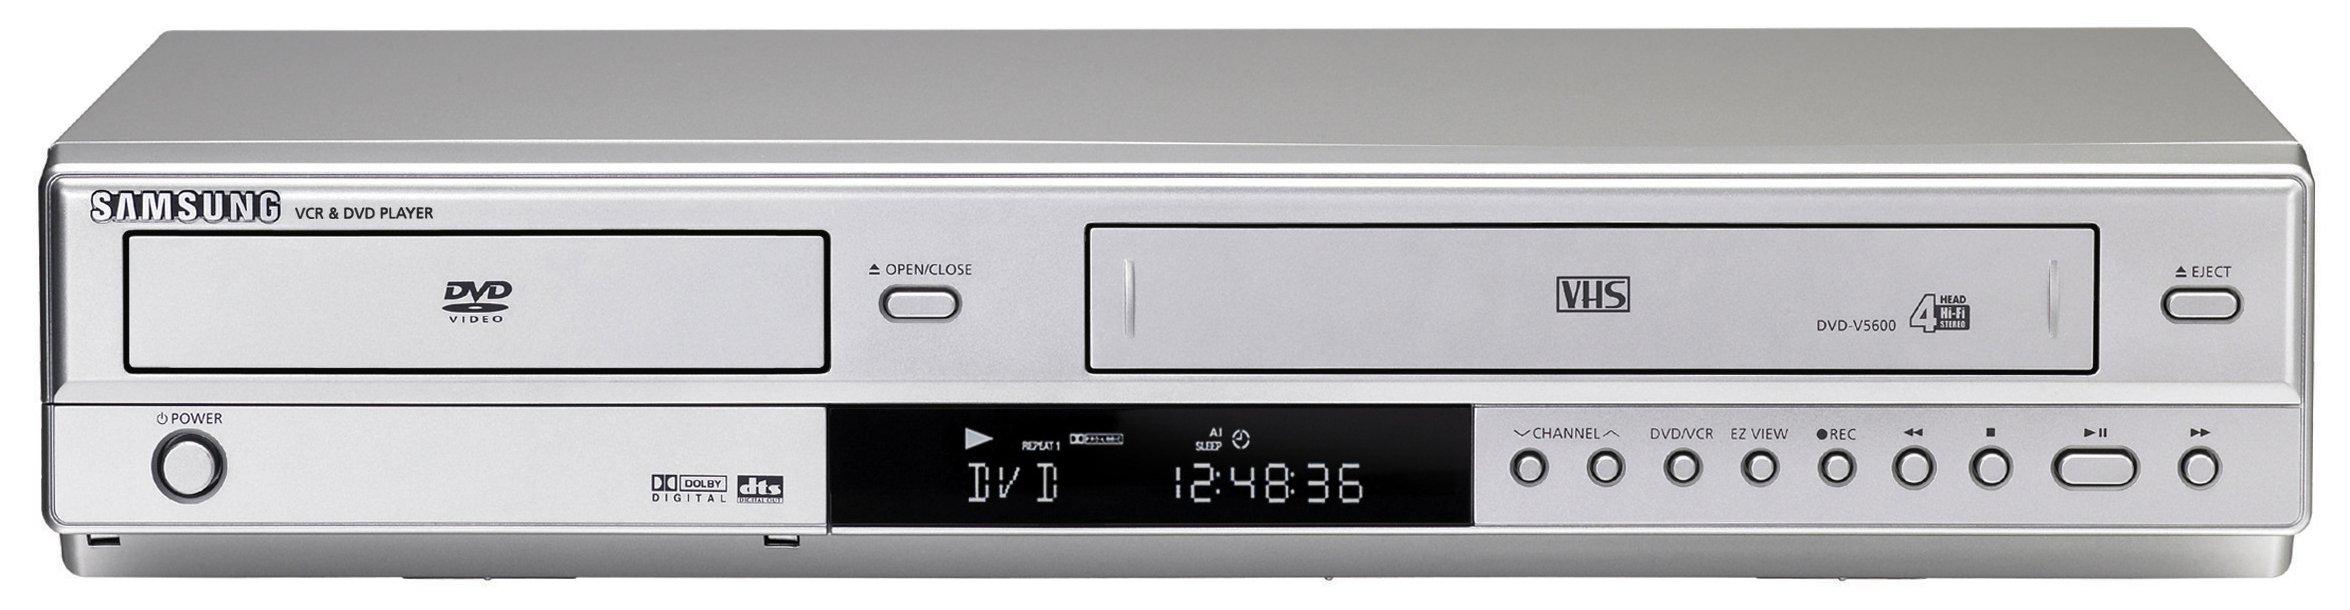 Samsung DVD V5650 DVD VCR Combo